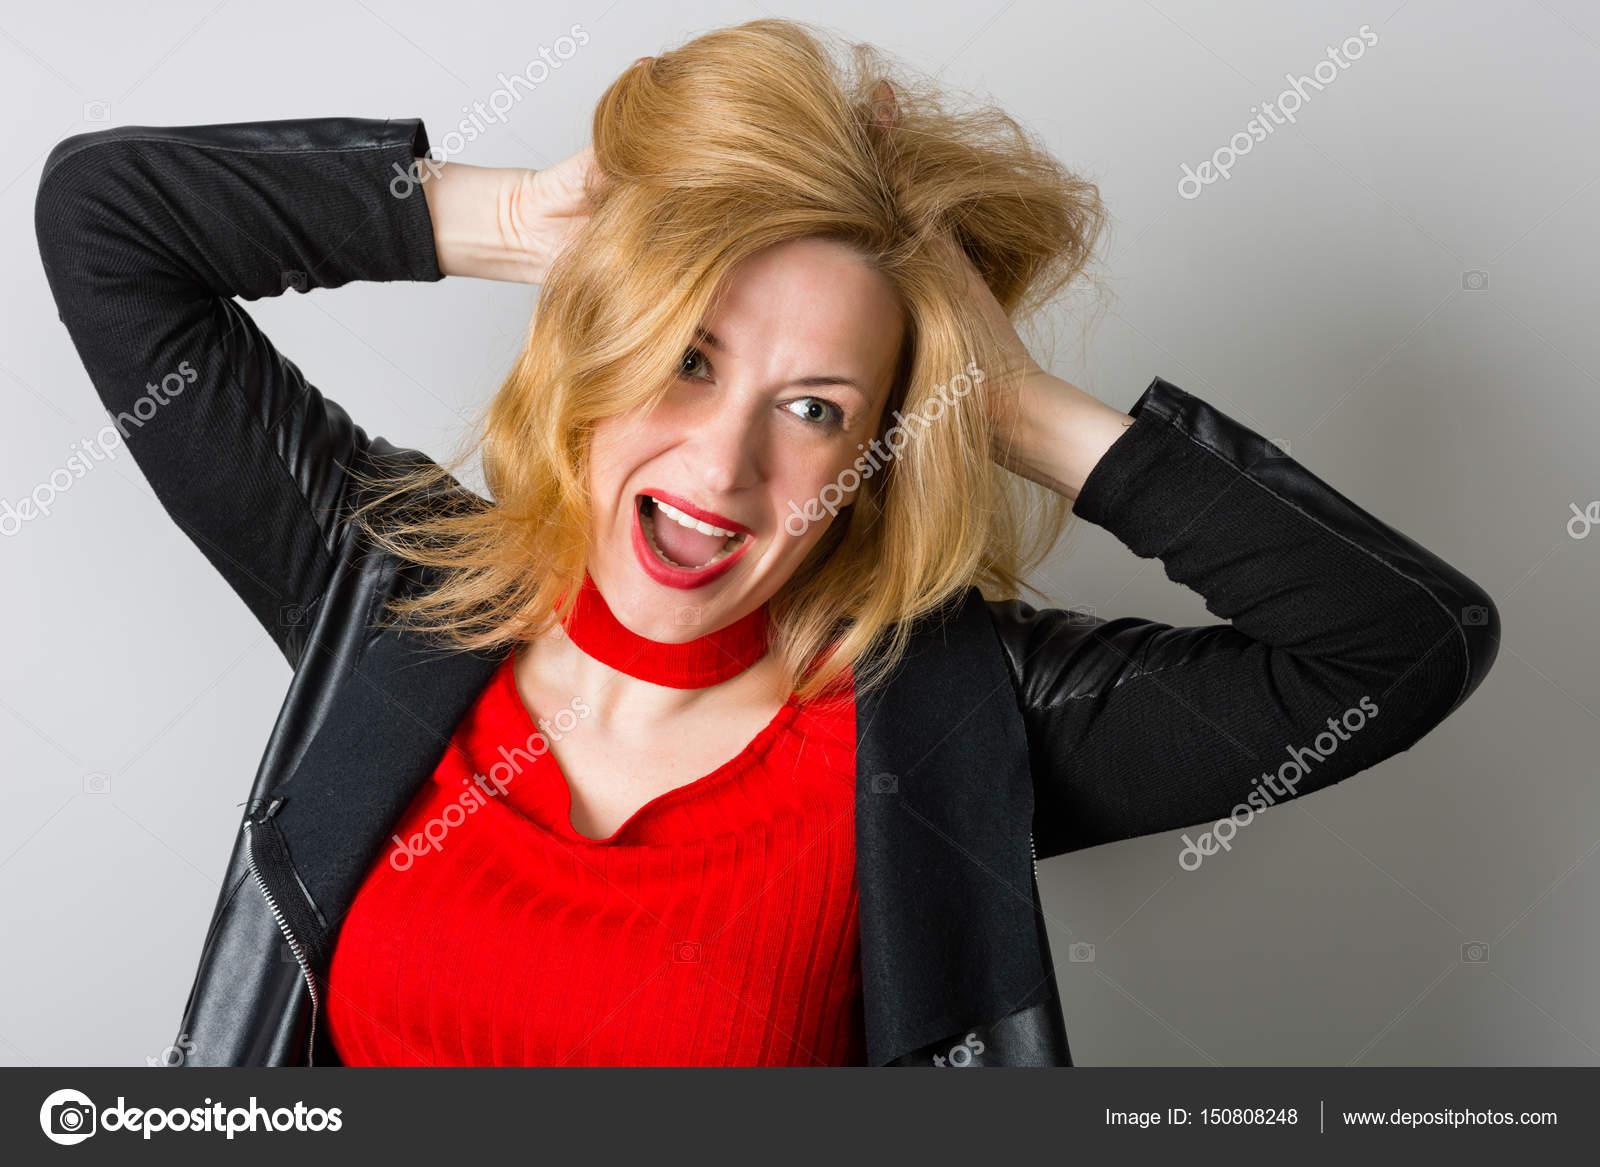 Ausdrucksstarke Frau in schwarzer Jacke gegen eine Wand